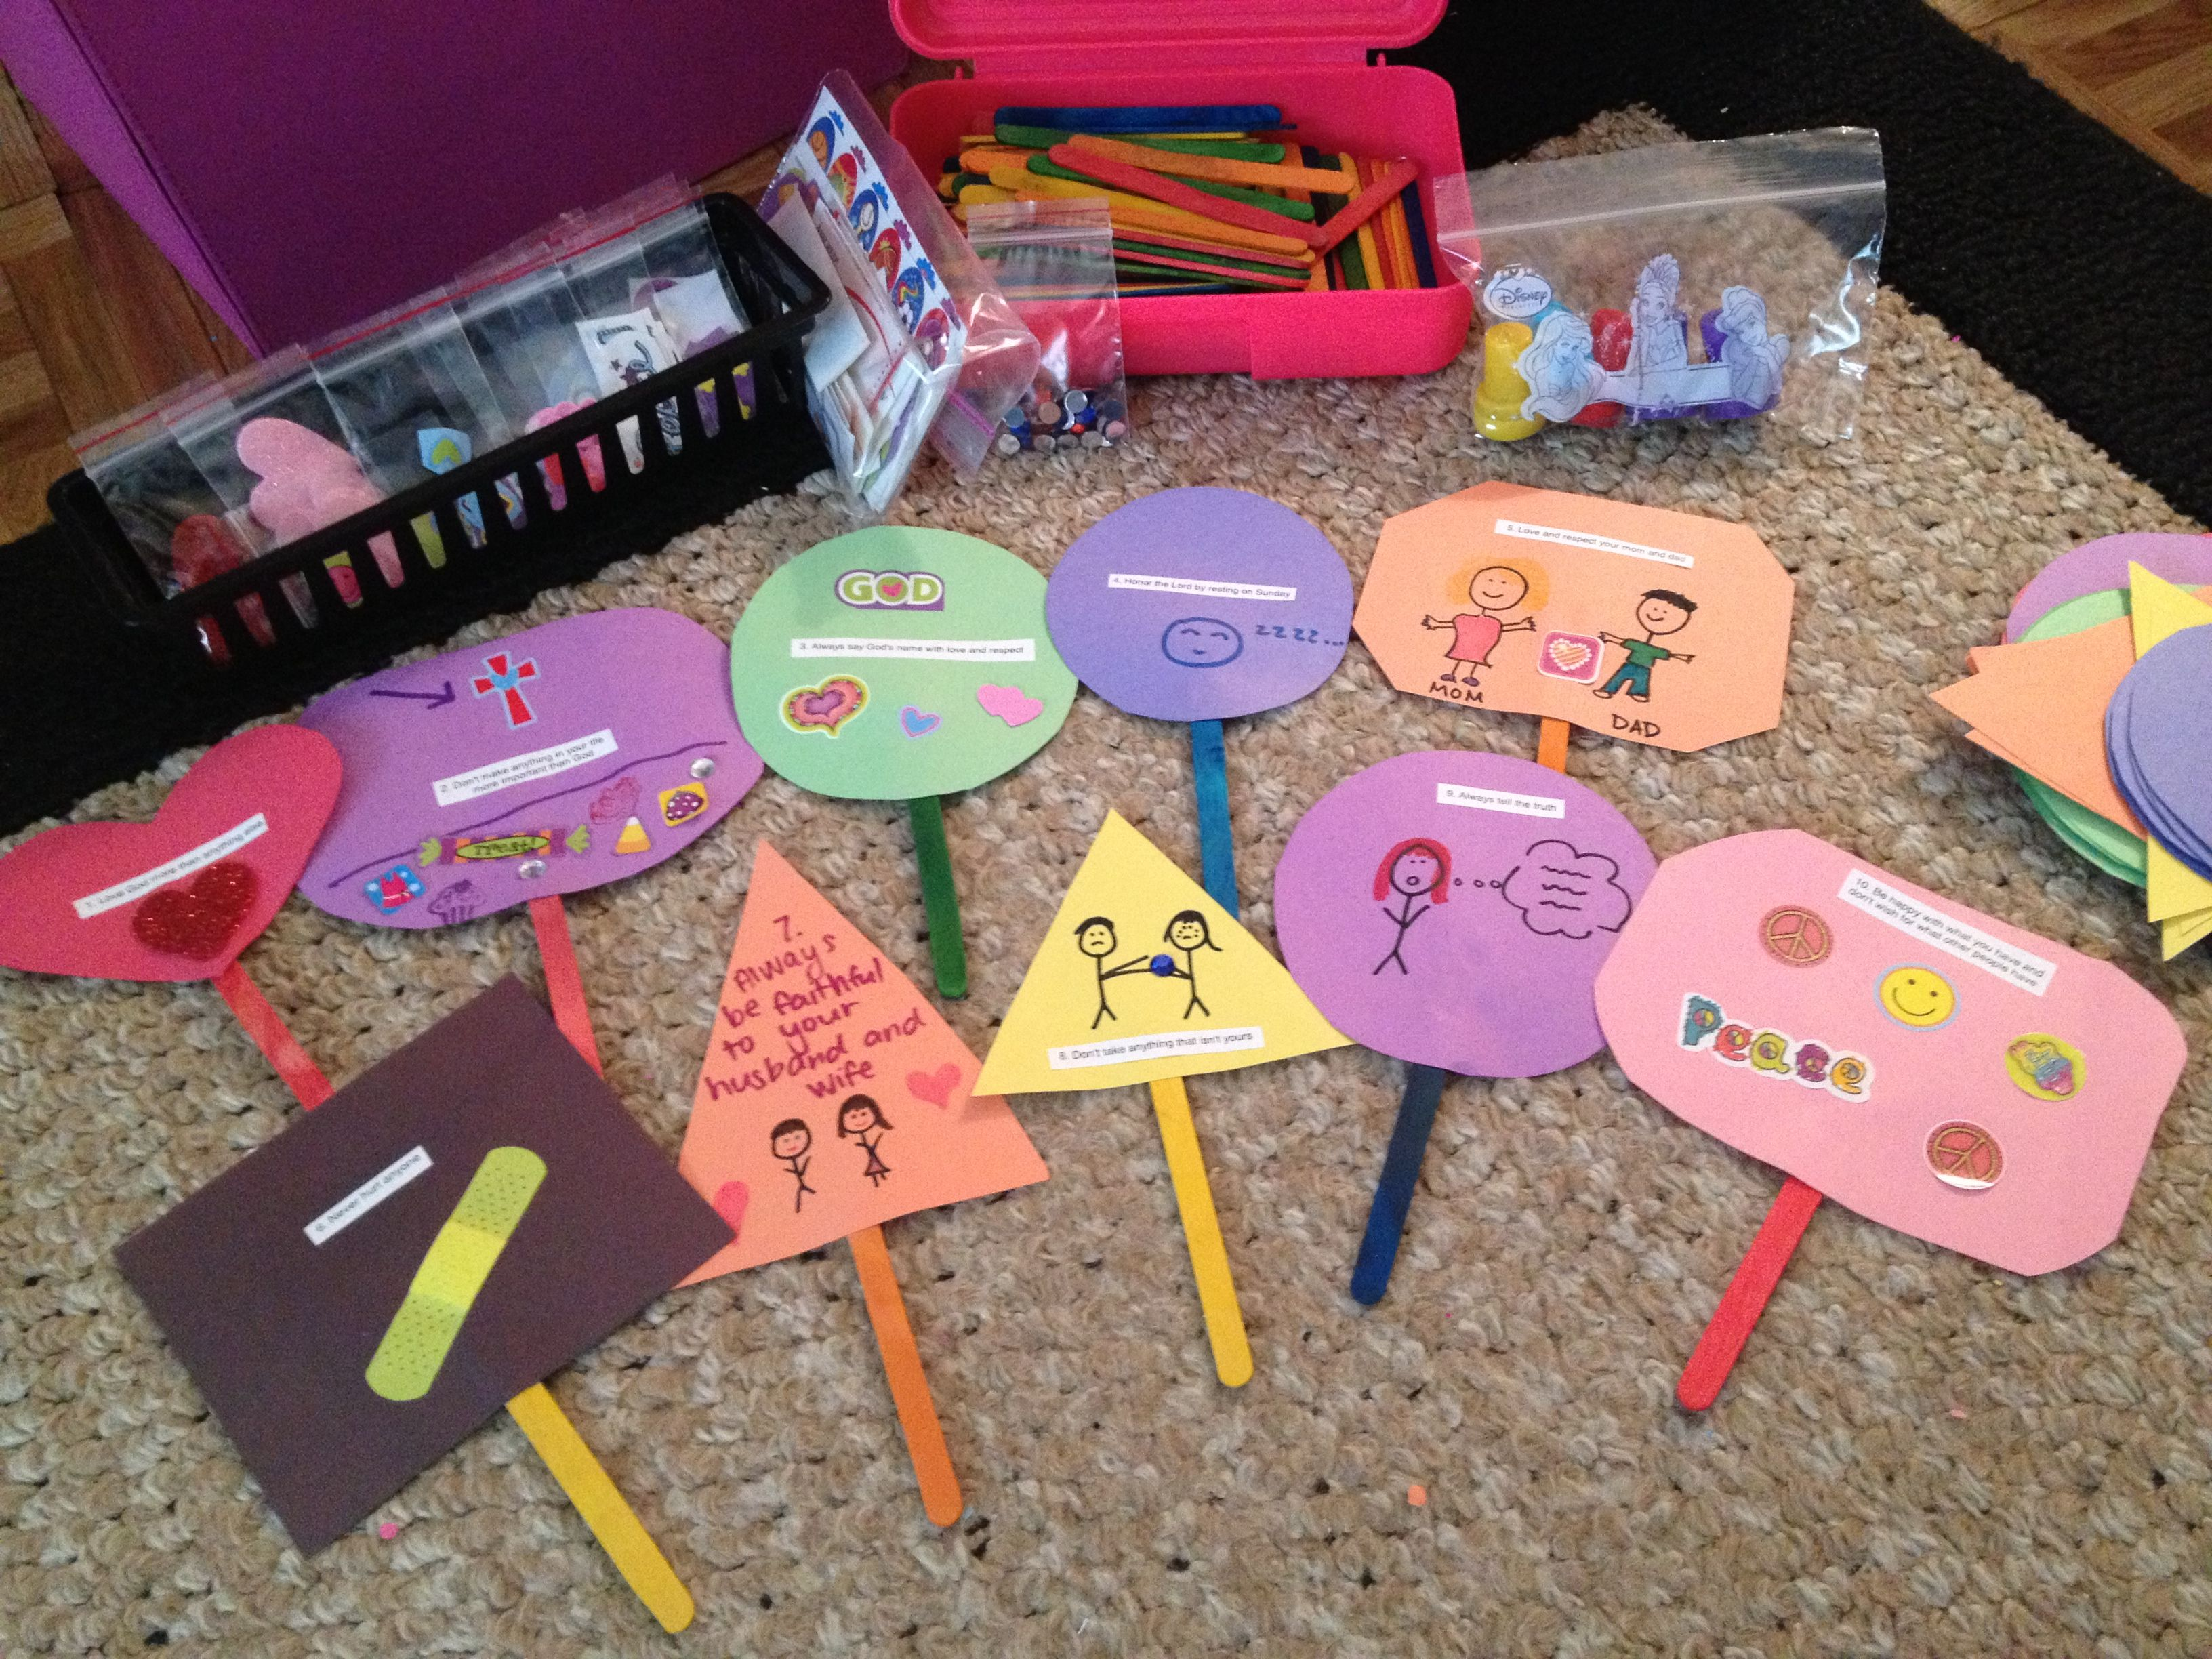 30+ 10 commandments crafts ideas ideas